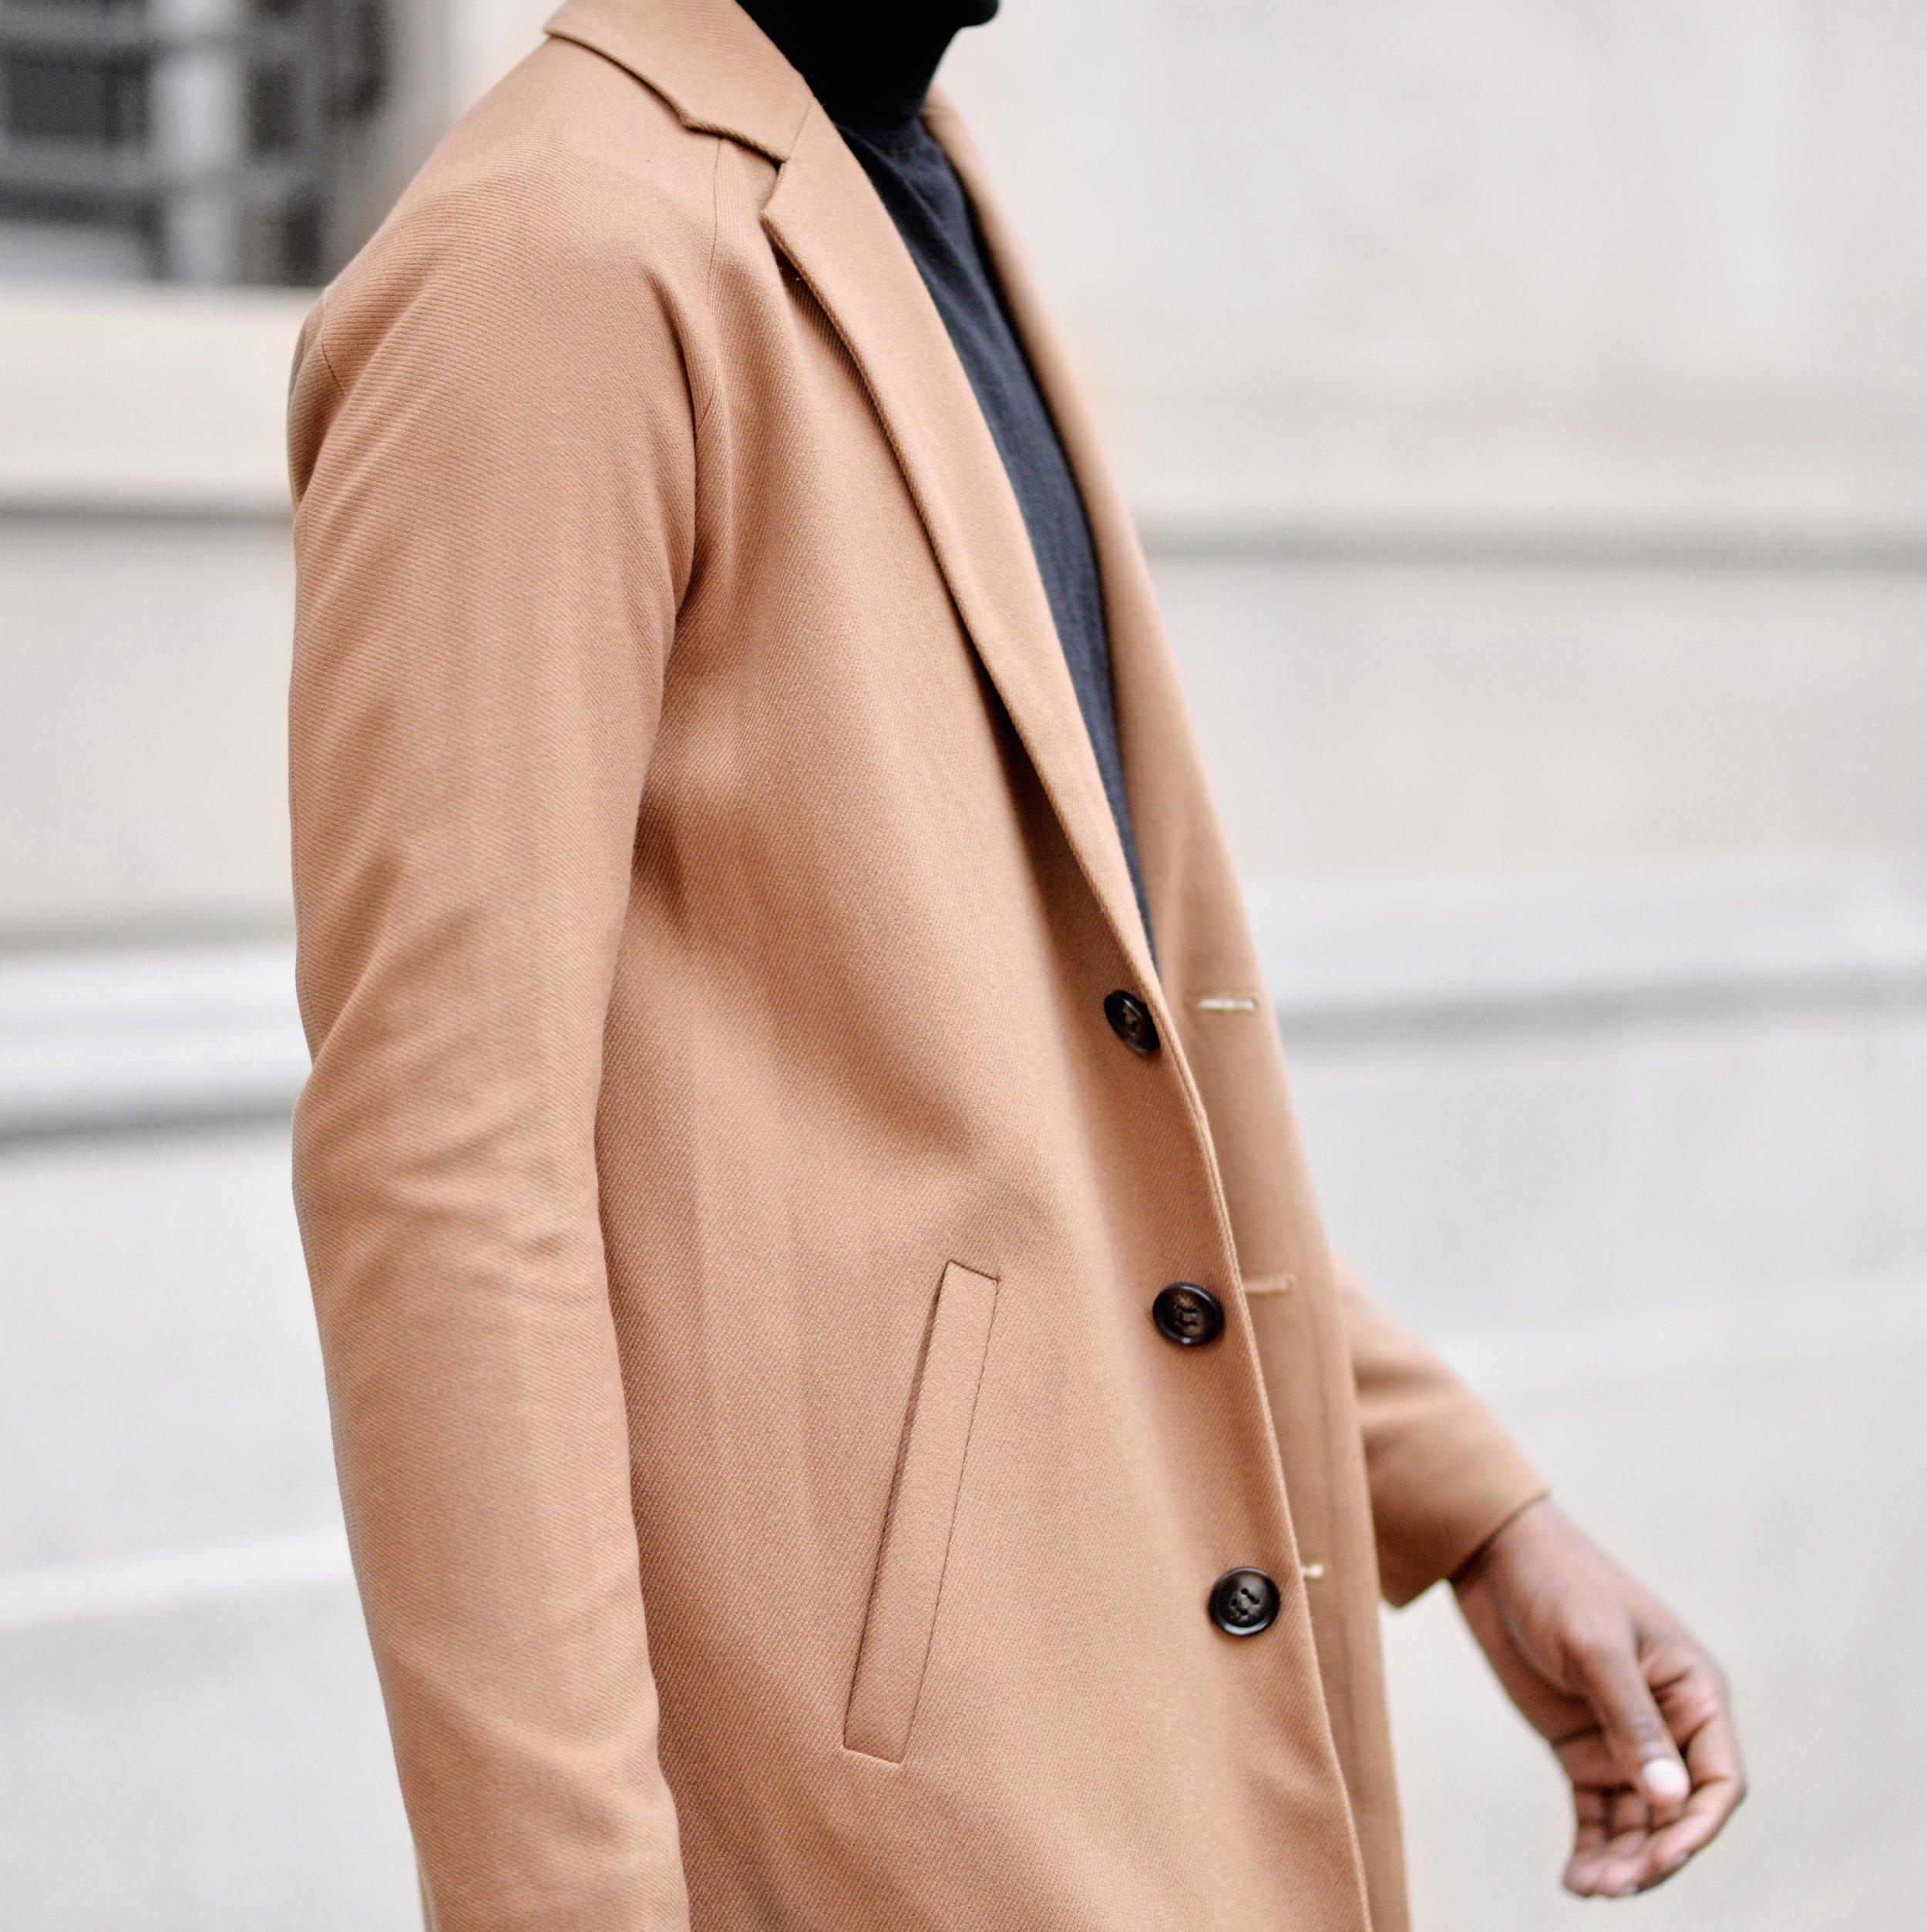 Tan overcoat and turtleneck